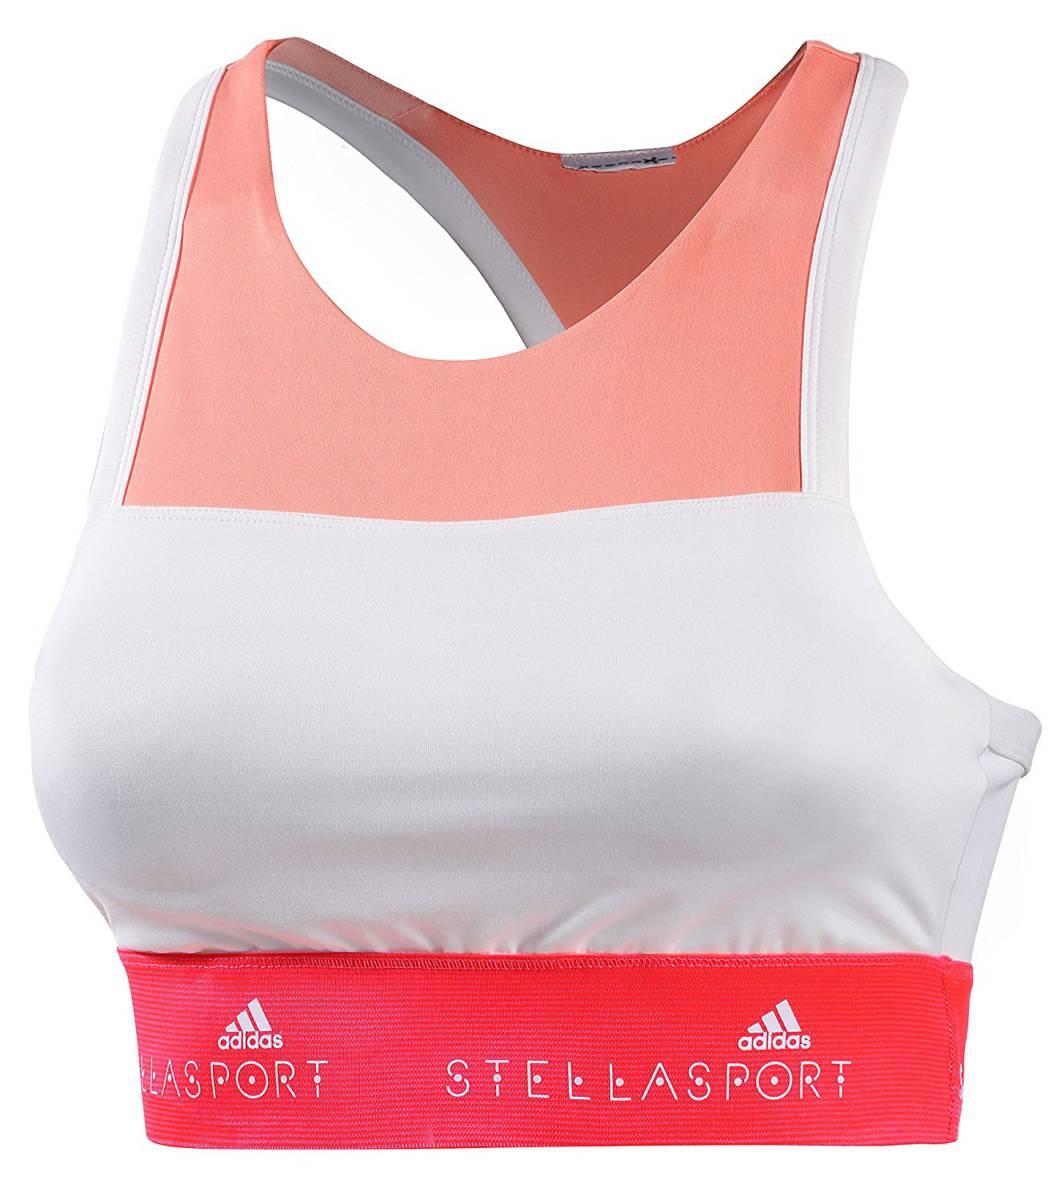 sports bra by adidas stellasport